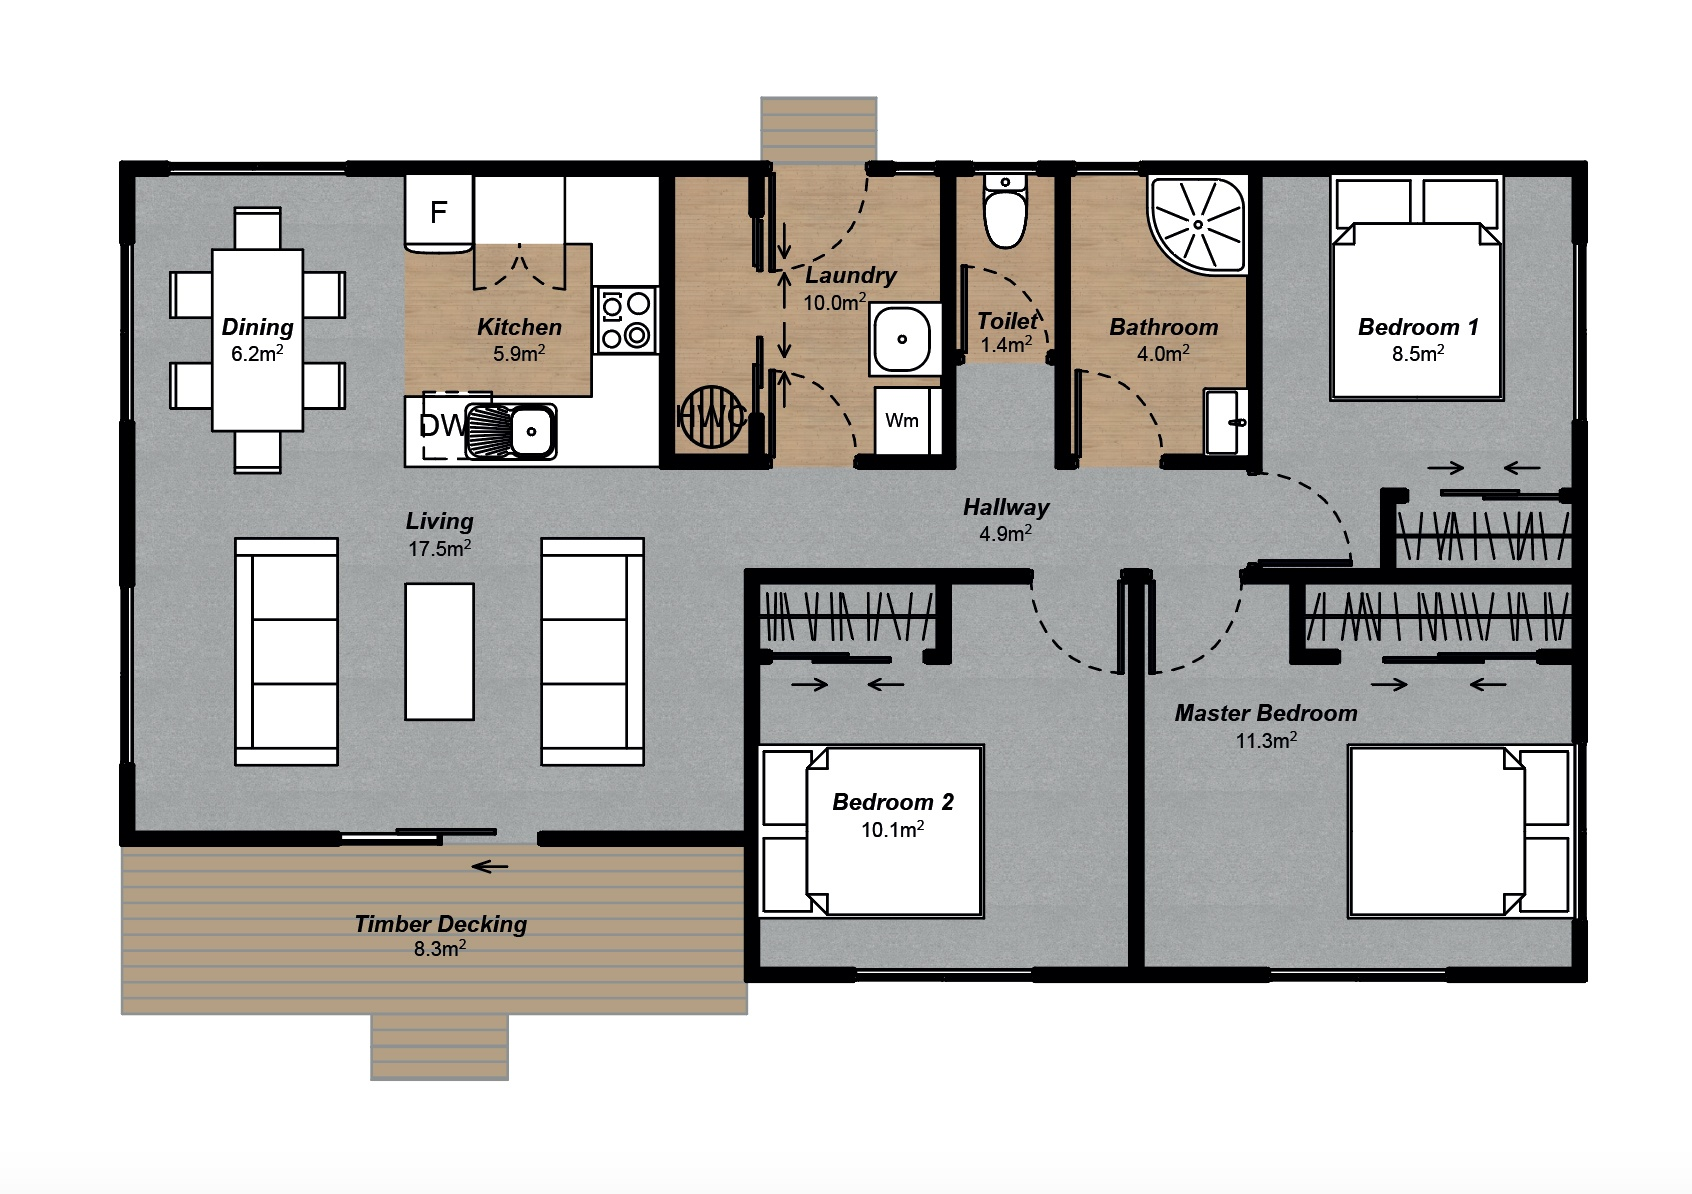 2IC farm home floorplan